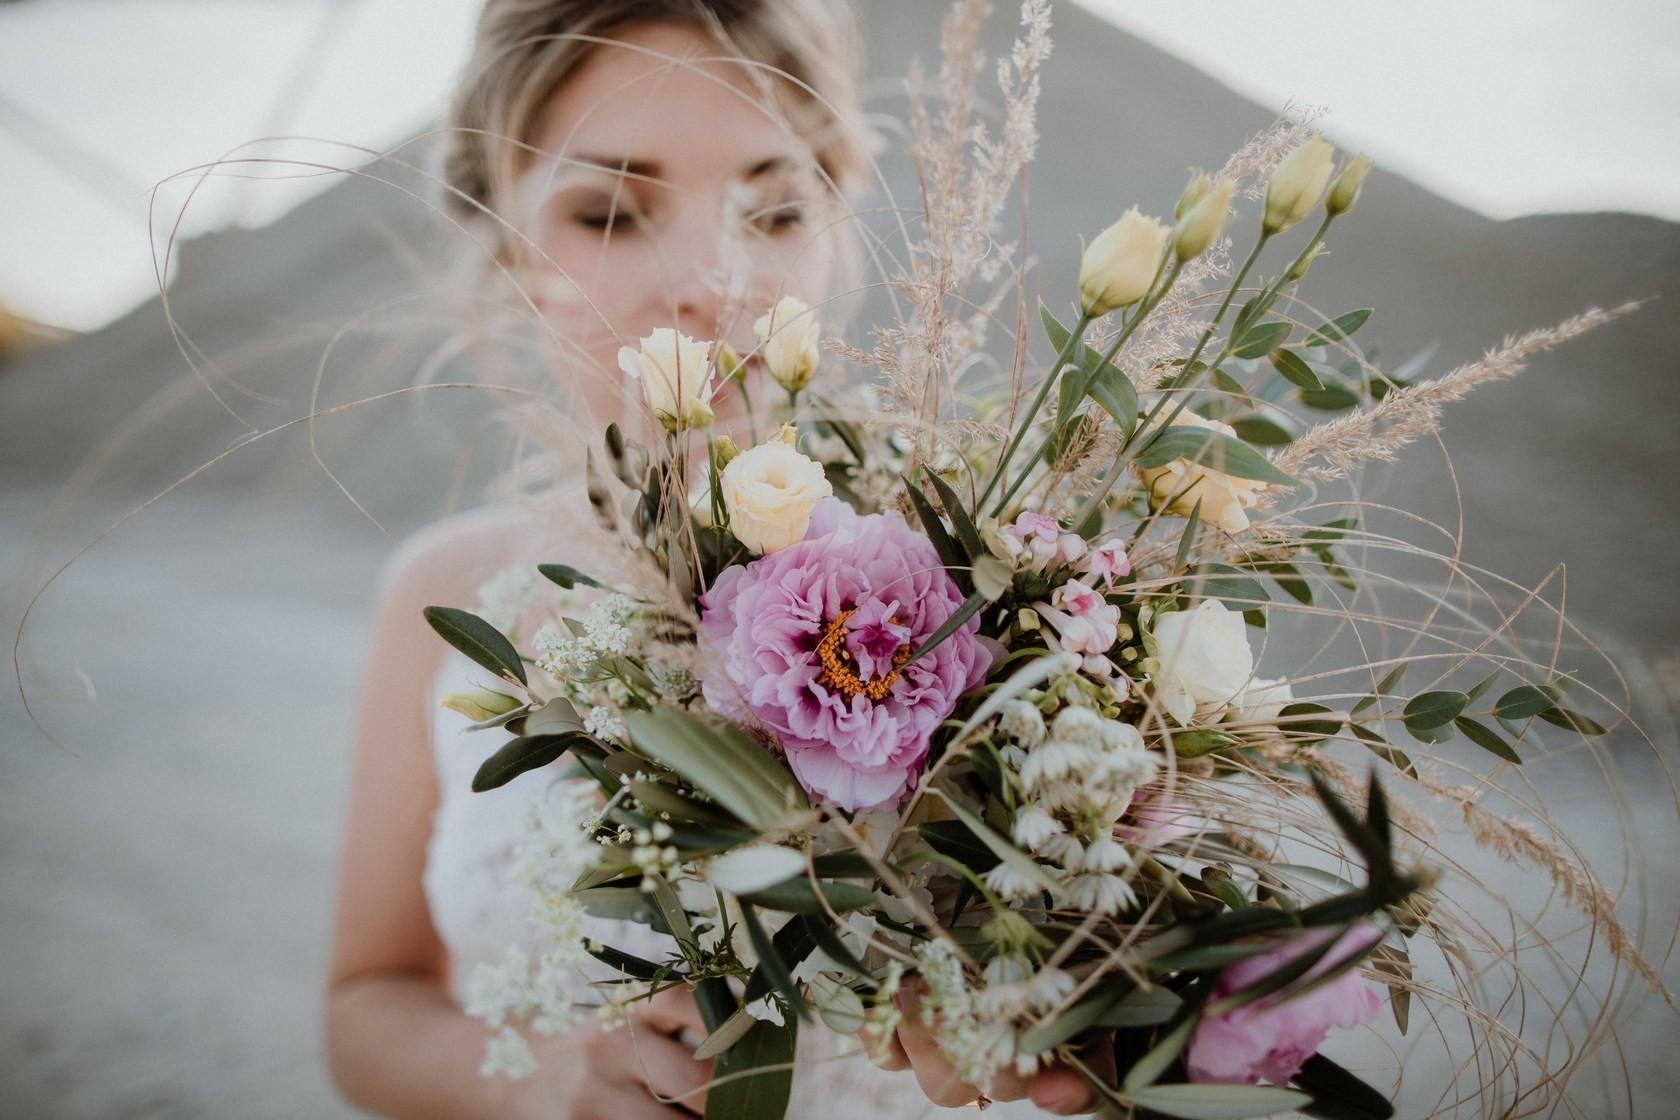 Wildflower_Julia_Pommerenke_Kiesgrube-4